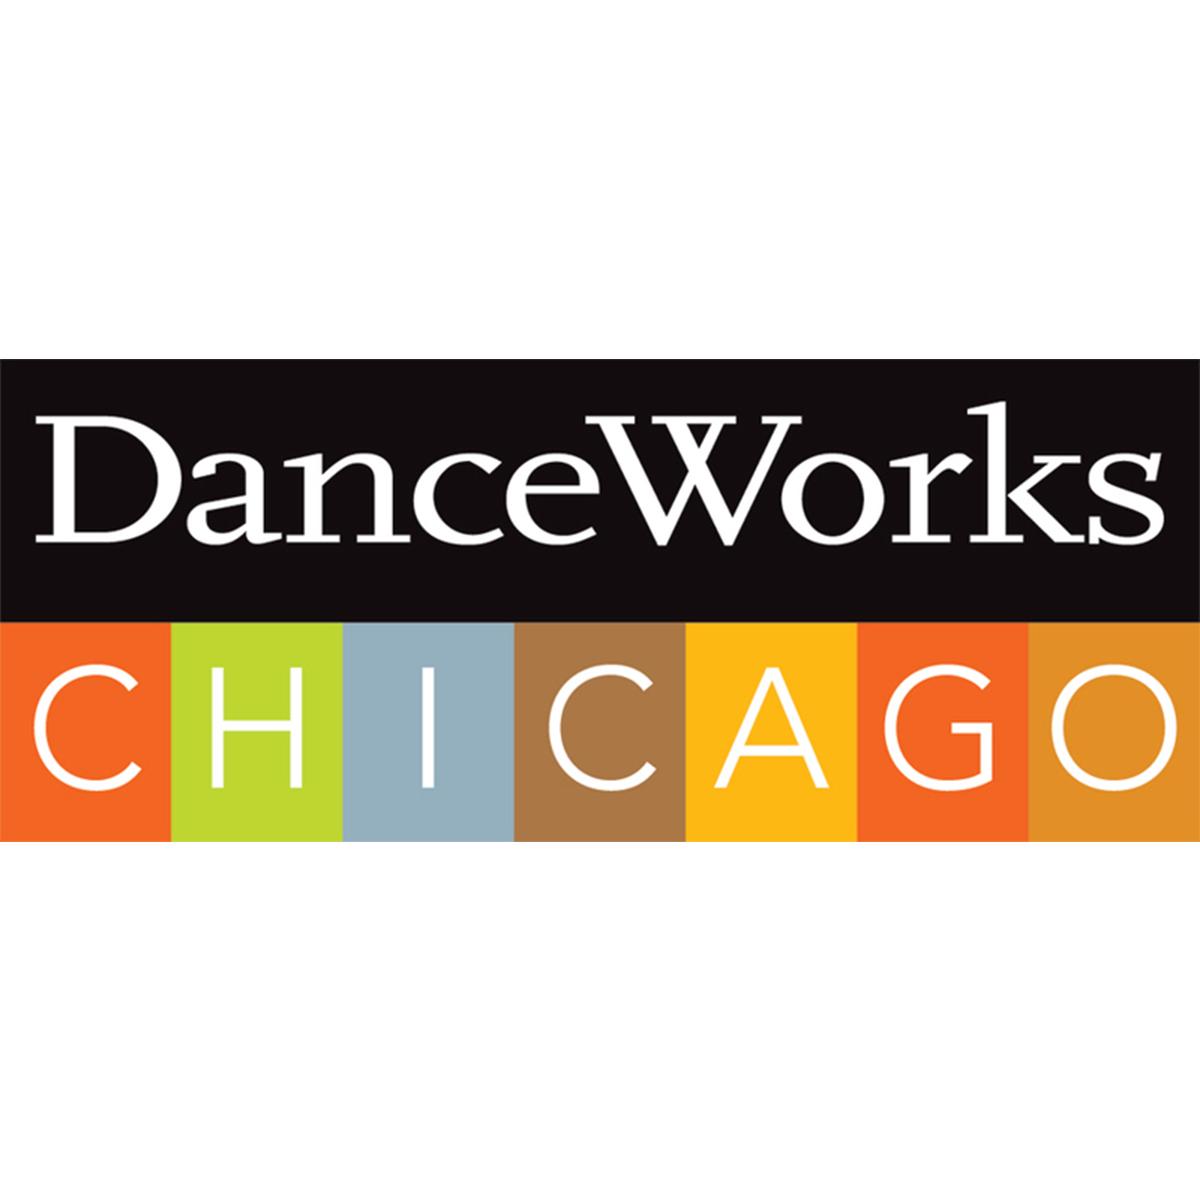 danceworks.jpg